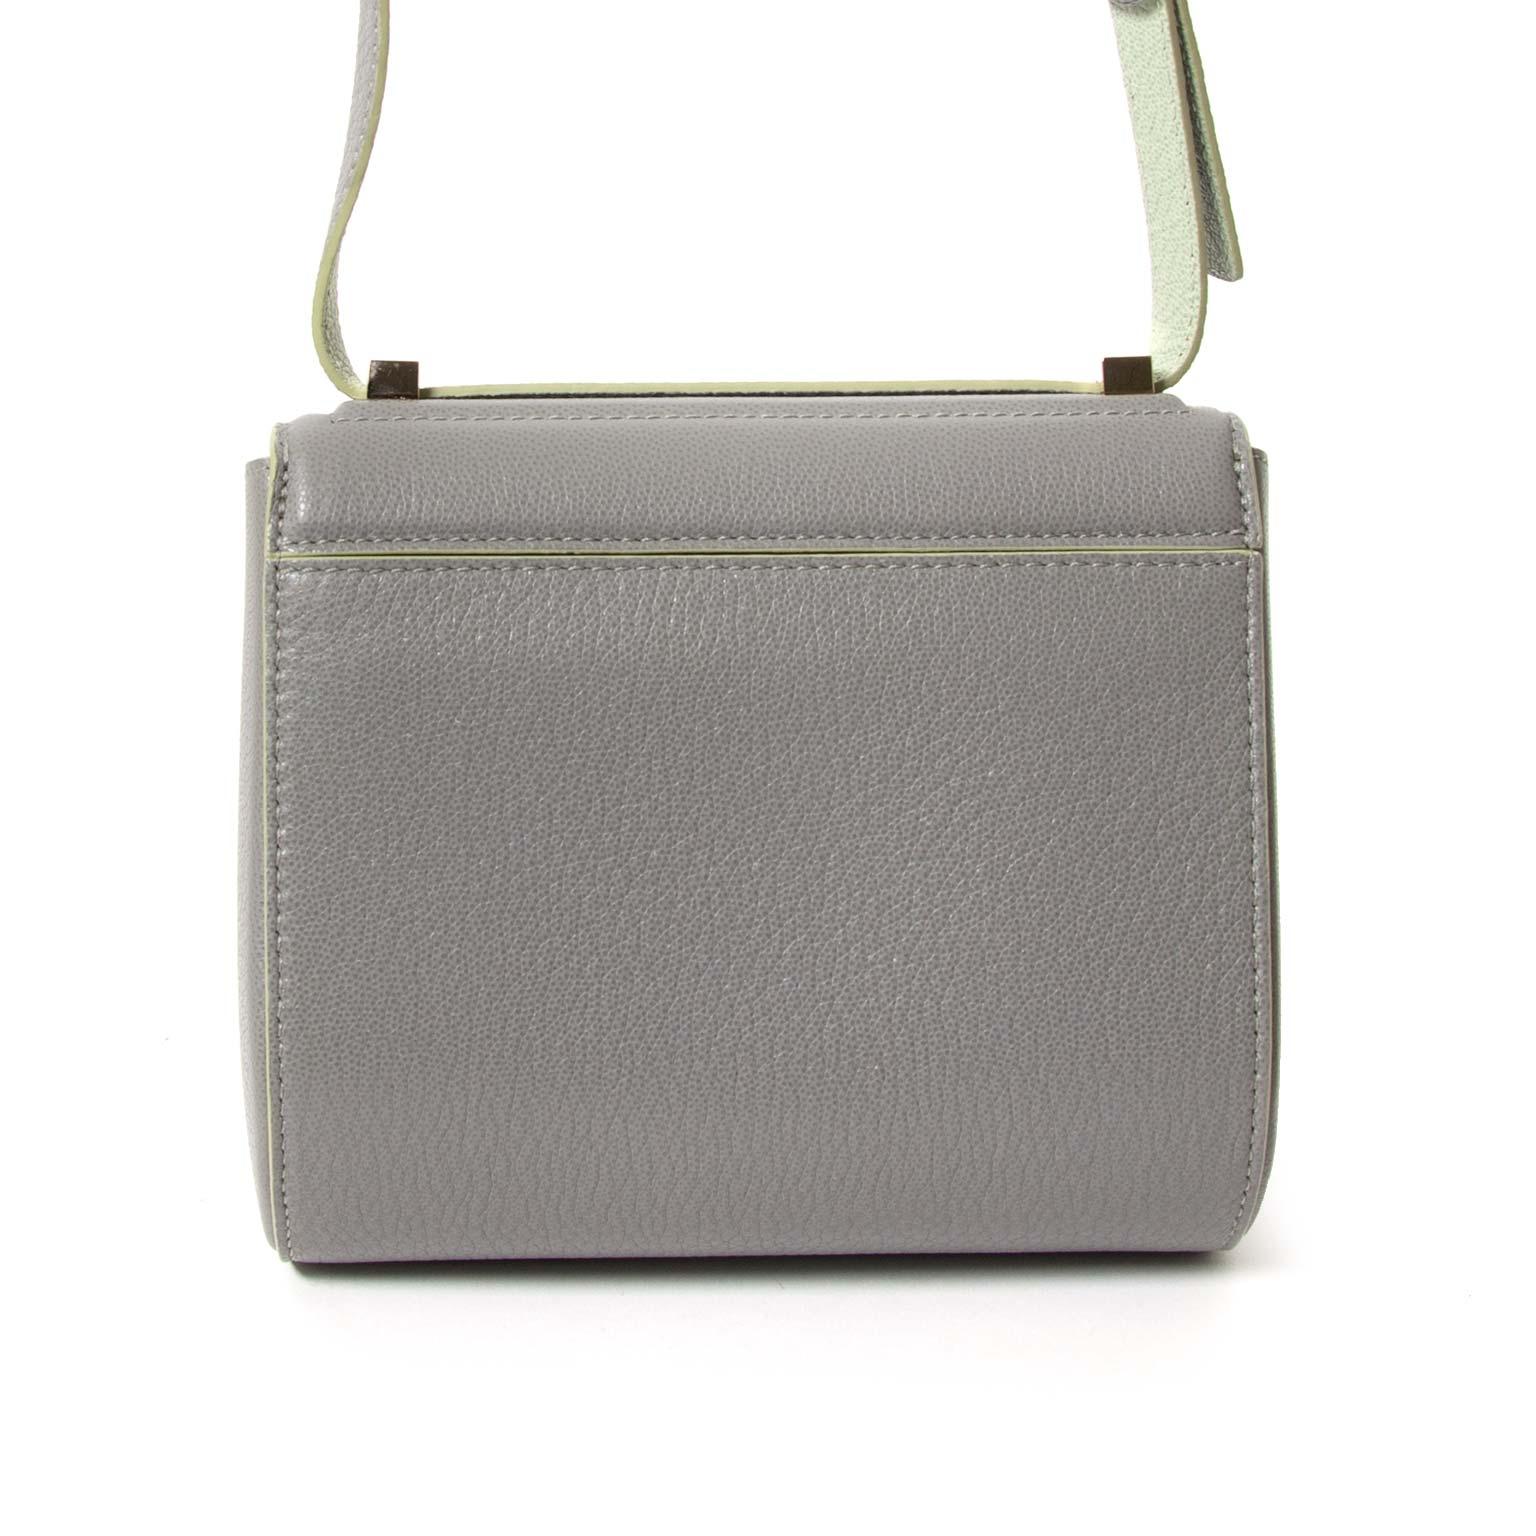 koop  Givenchy Pearl Grey Pandora Box Crossbody Bag  en betaal veilig online